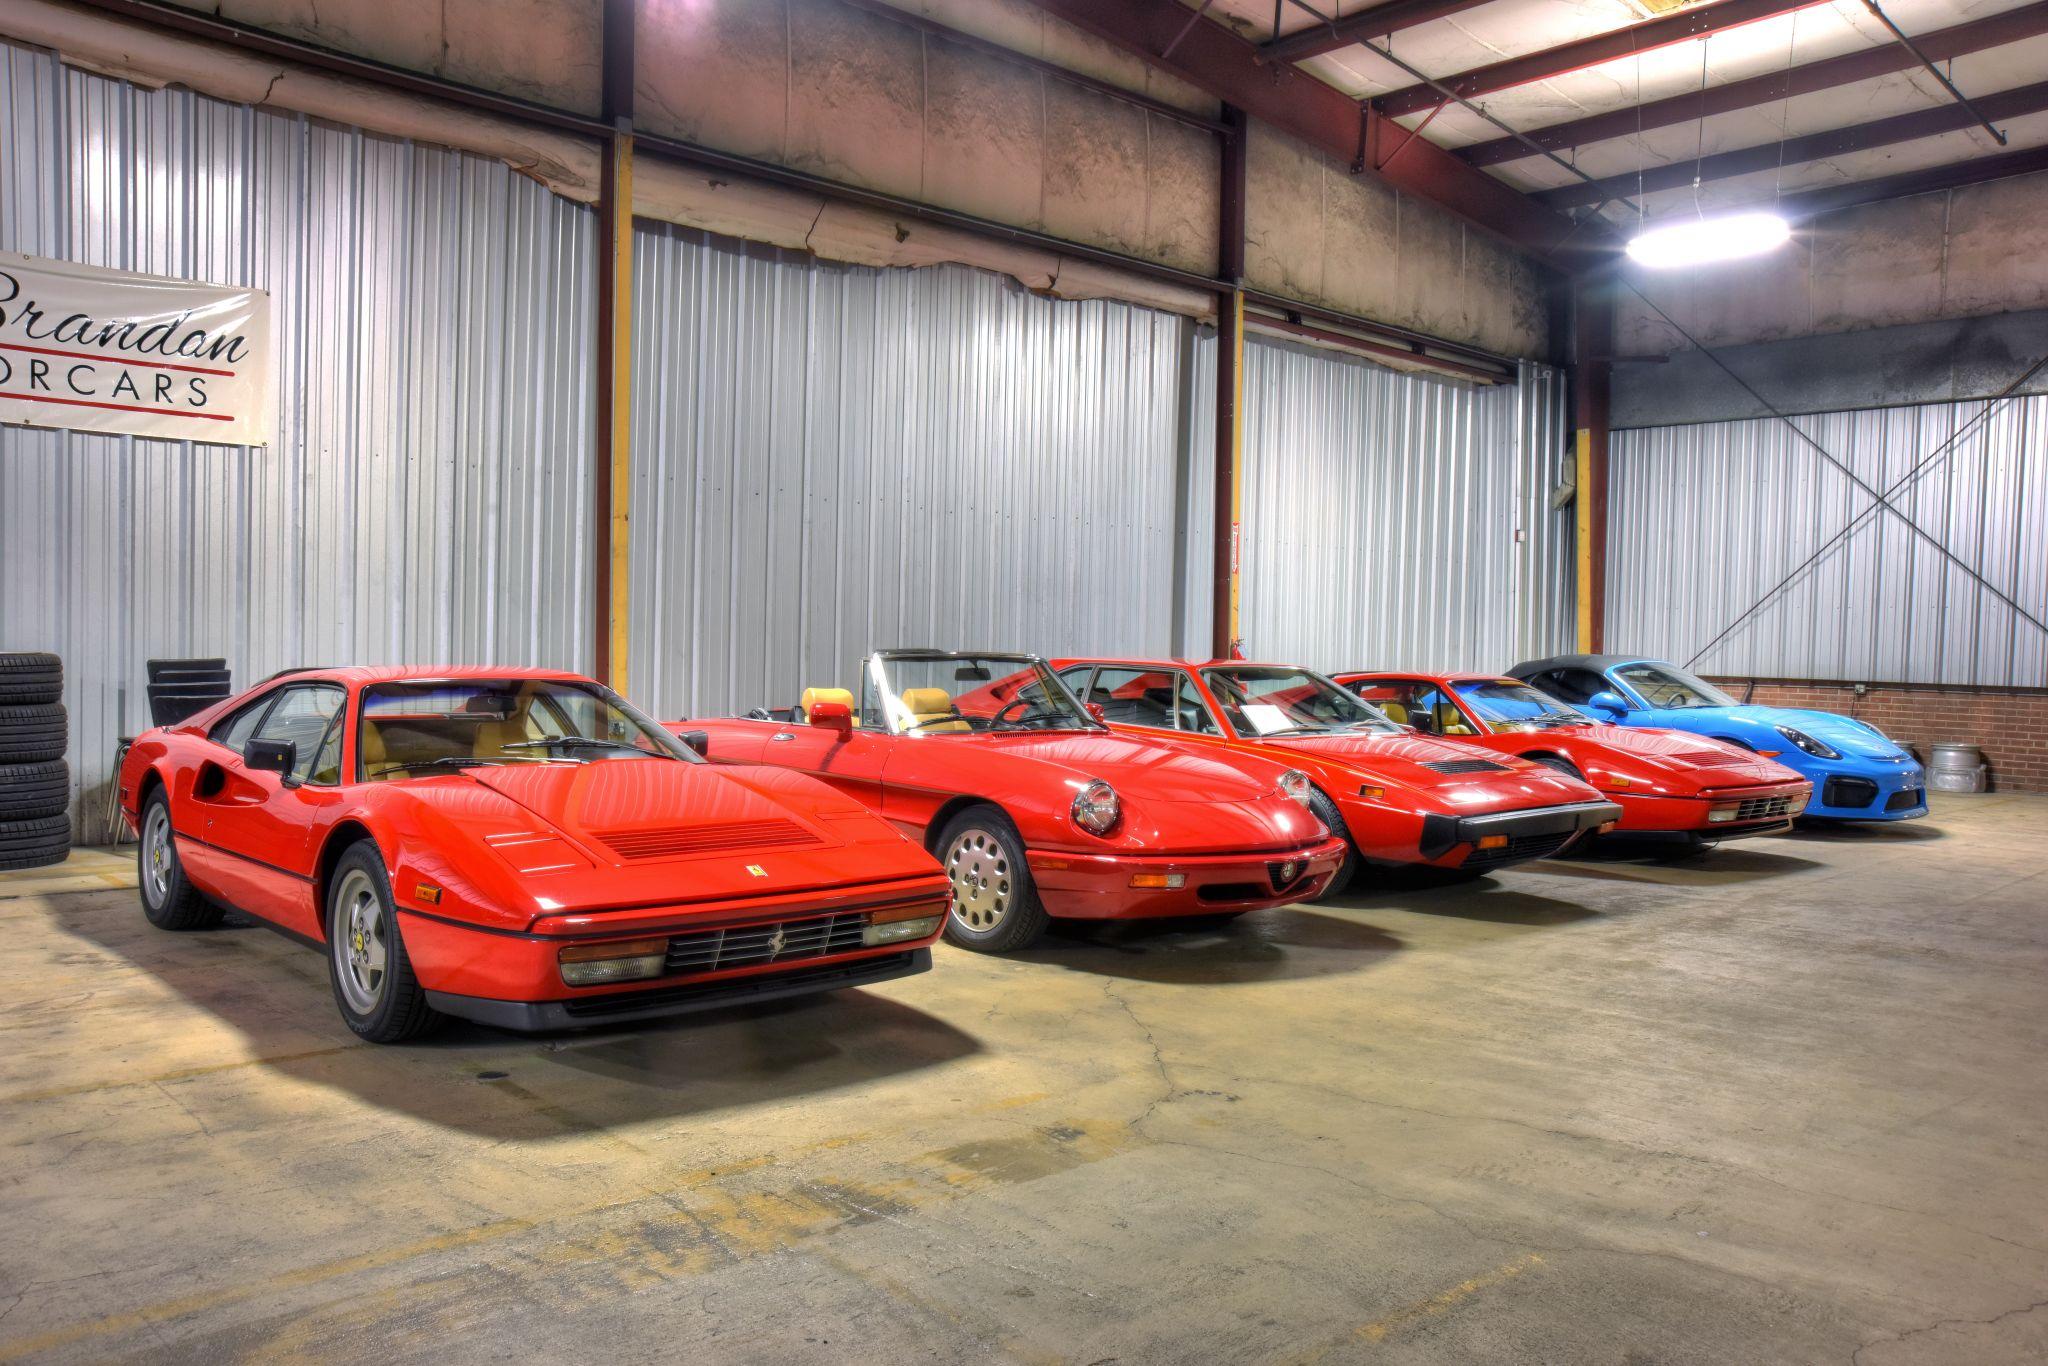 Houston car garage worth more than 20 million houston chronicle solutioingenieria Gallery